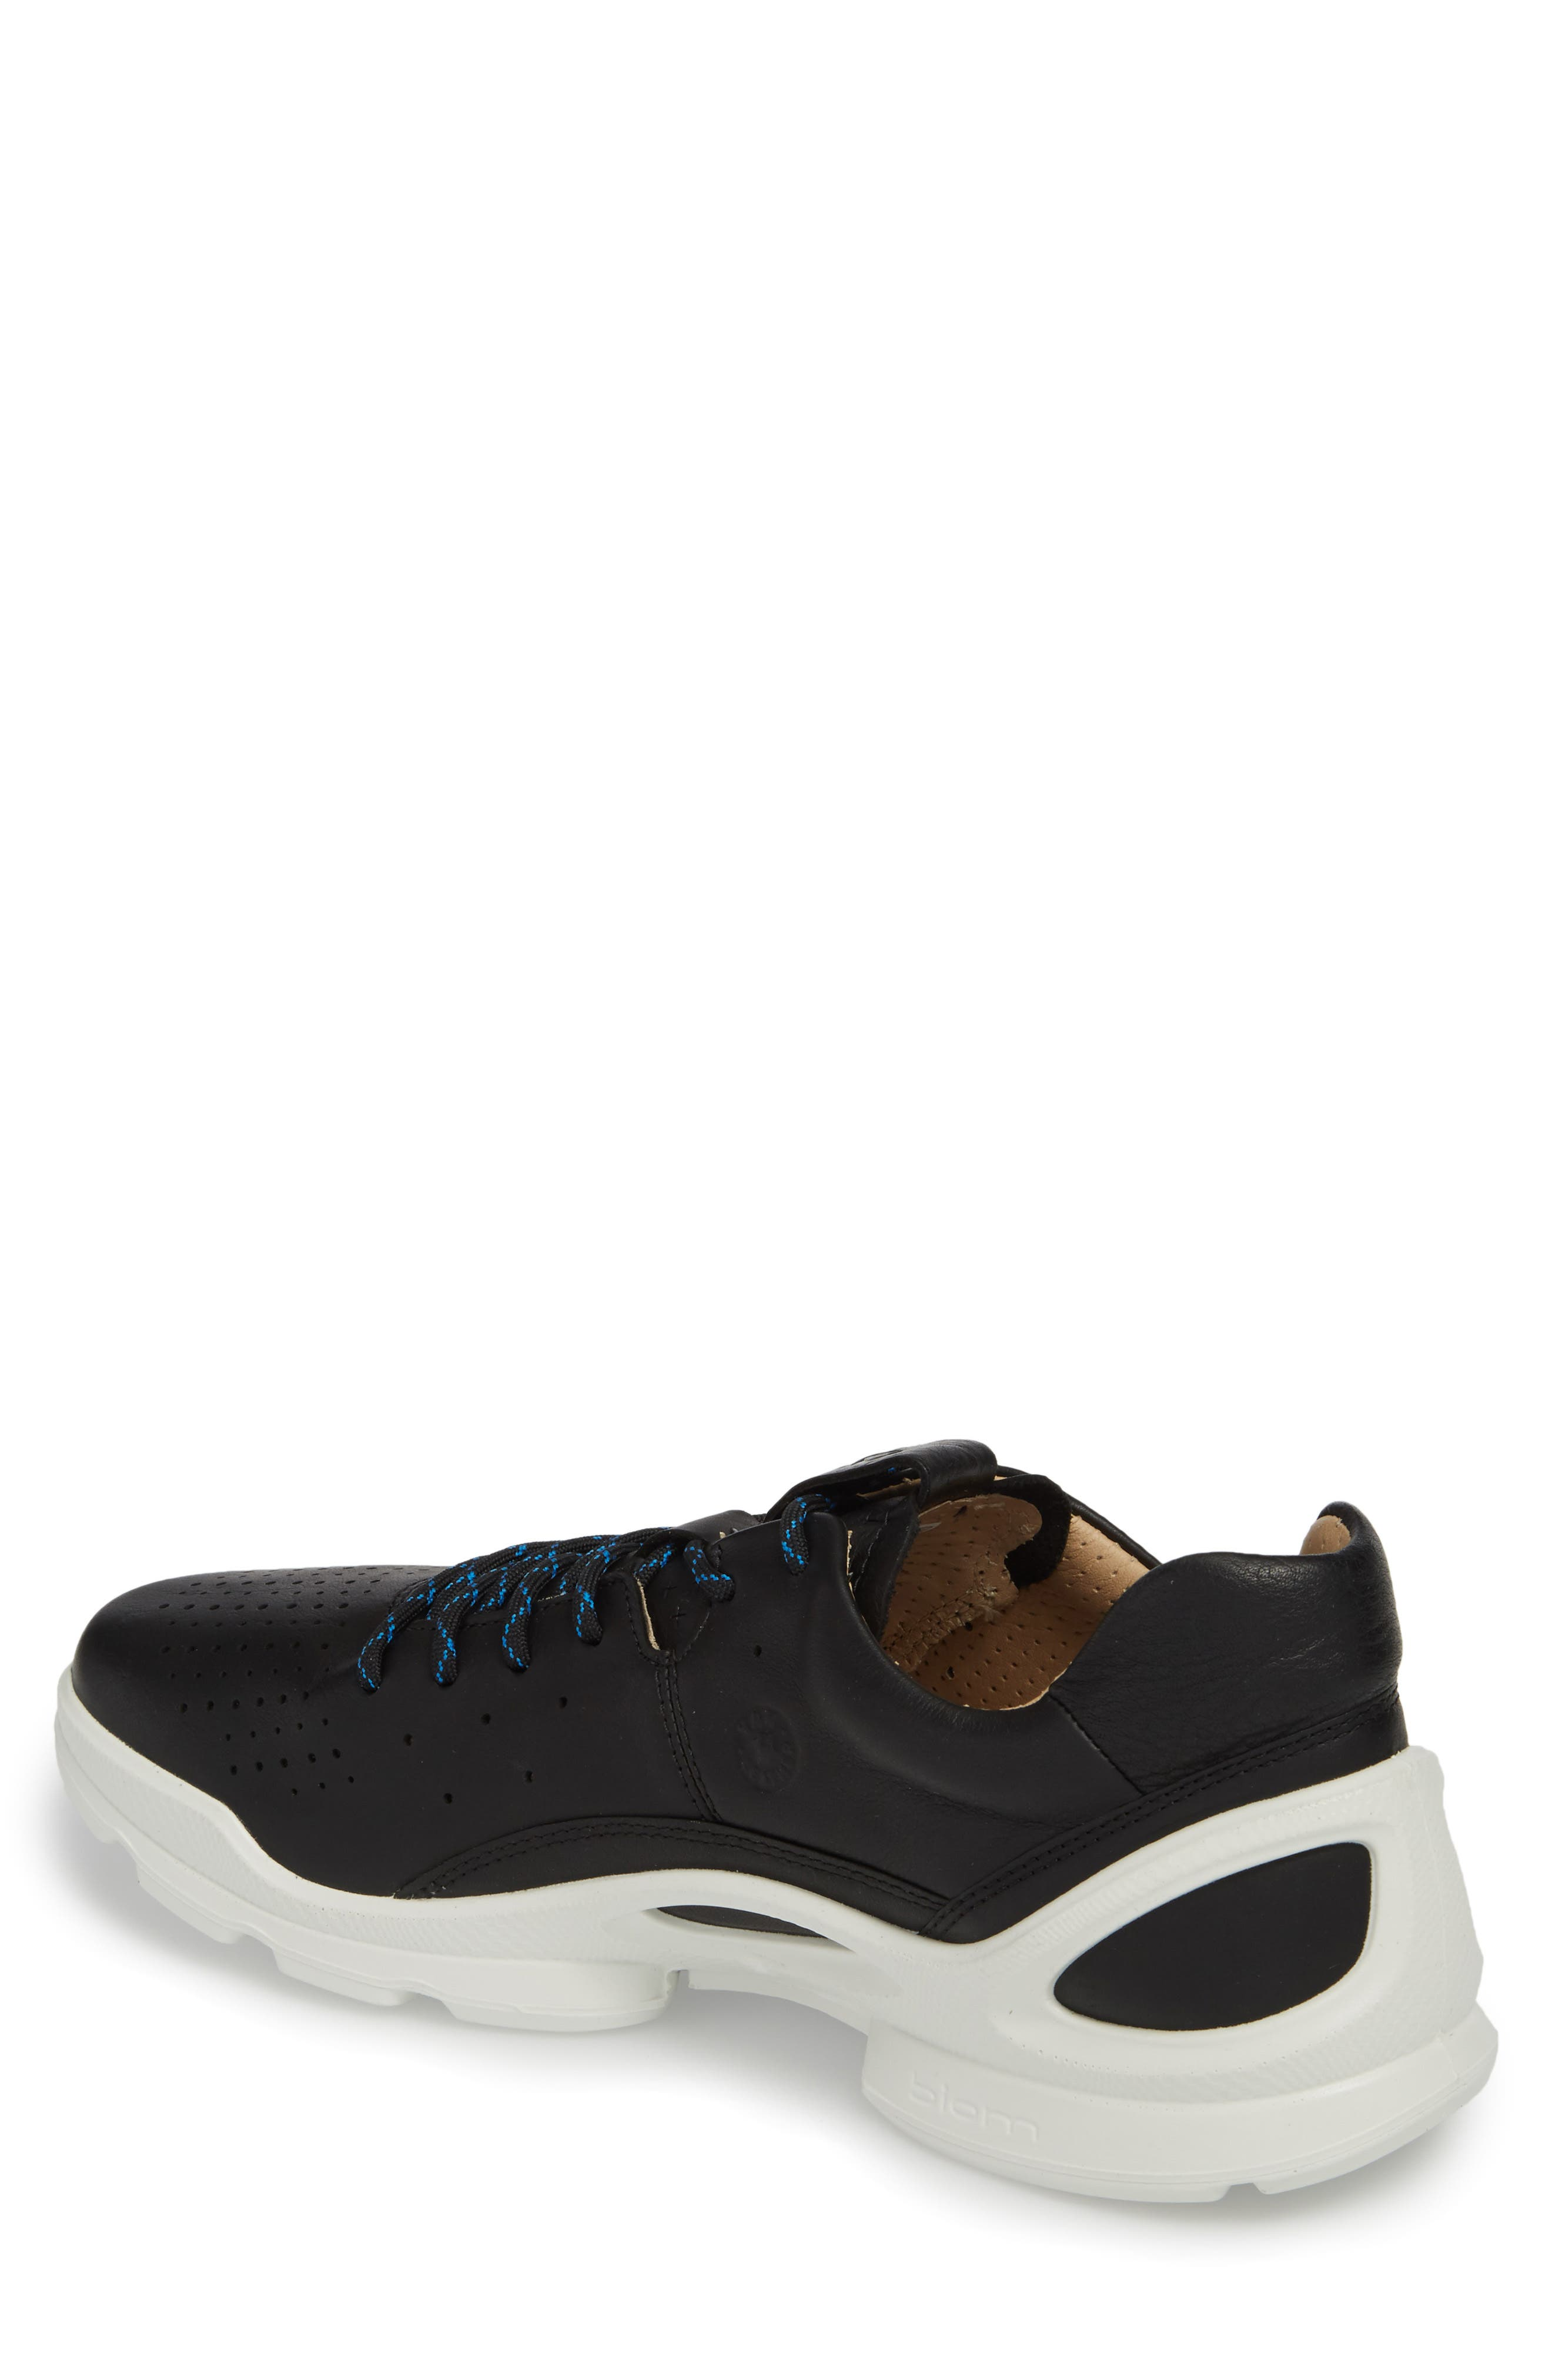 Biom Street Sneaker,                             Alternate thumbnail 2, color,                             008